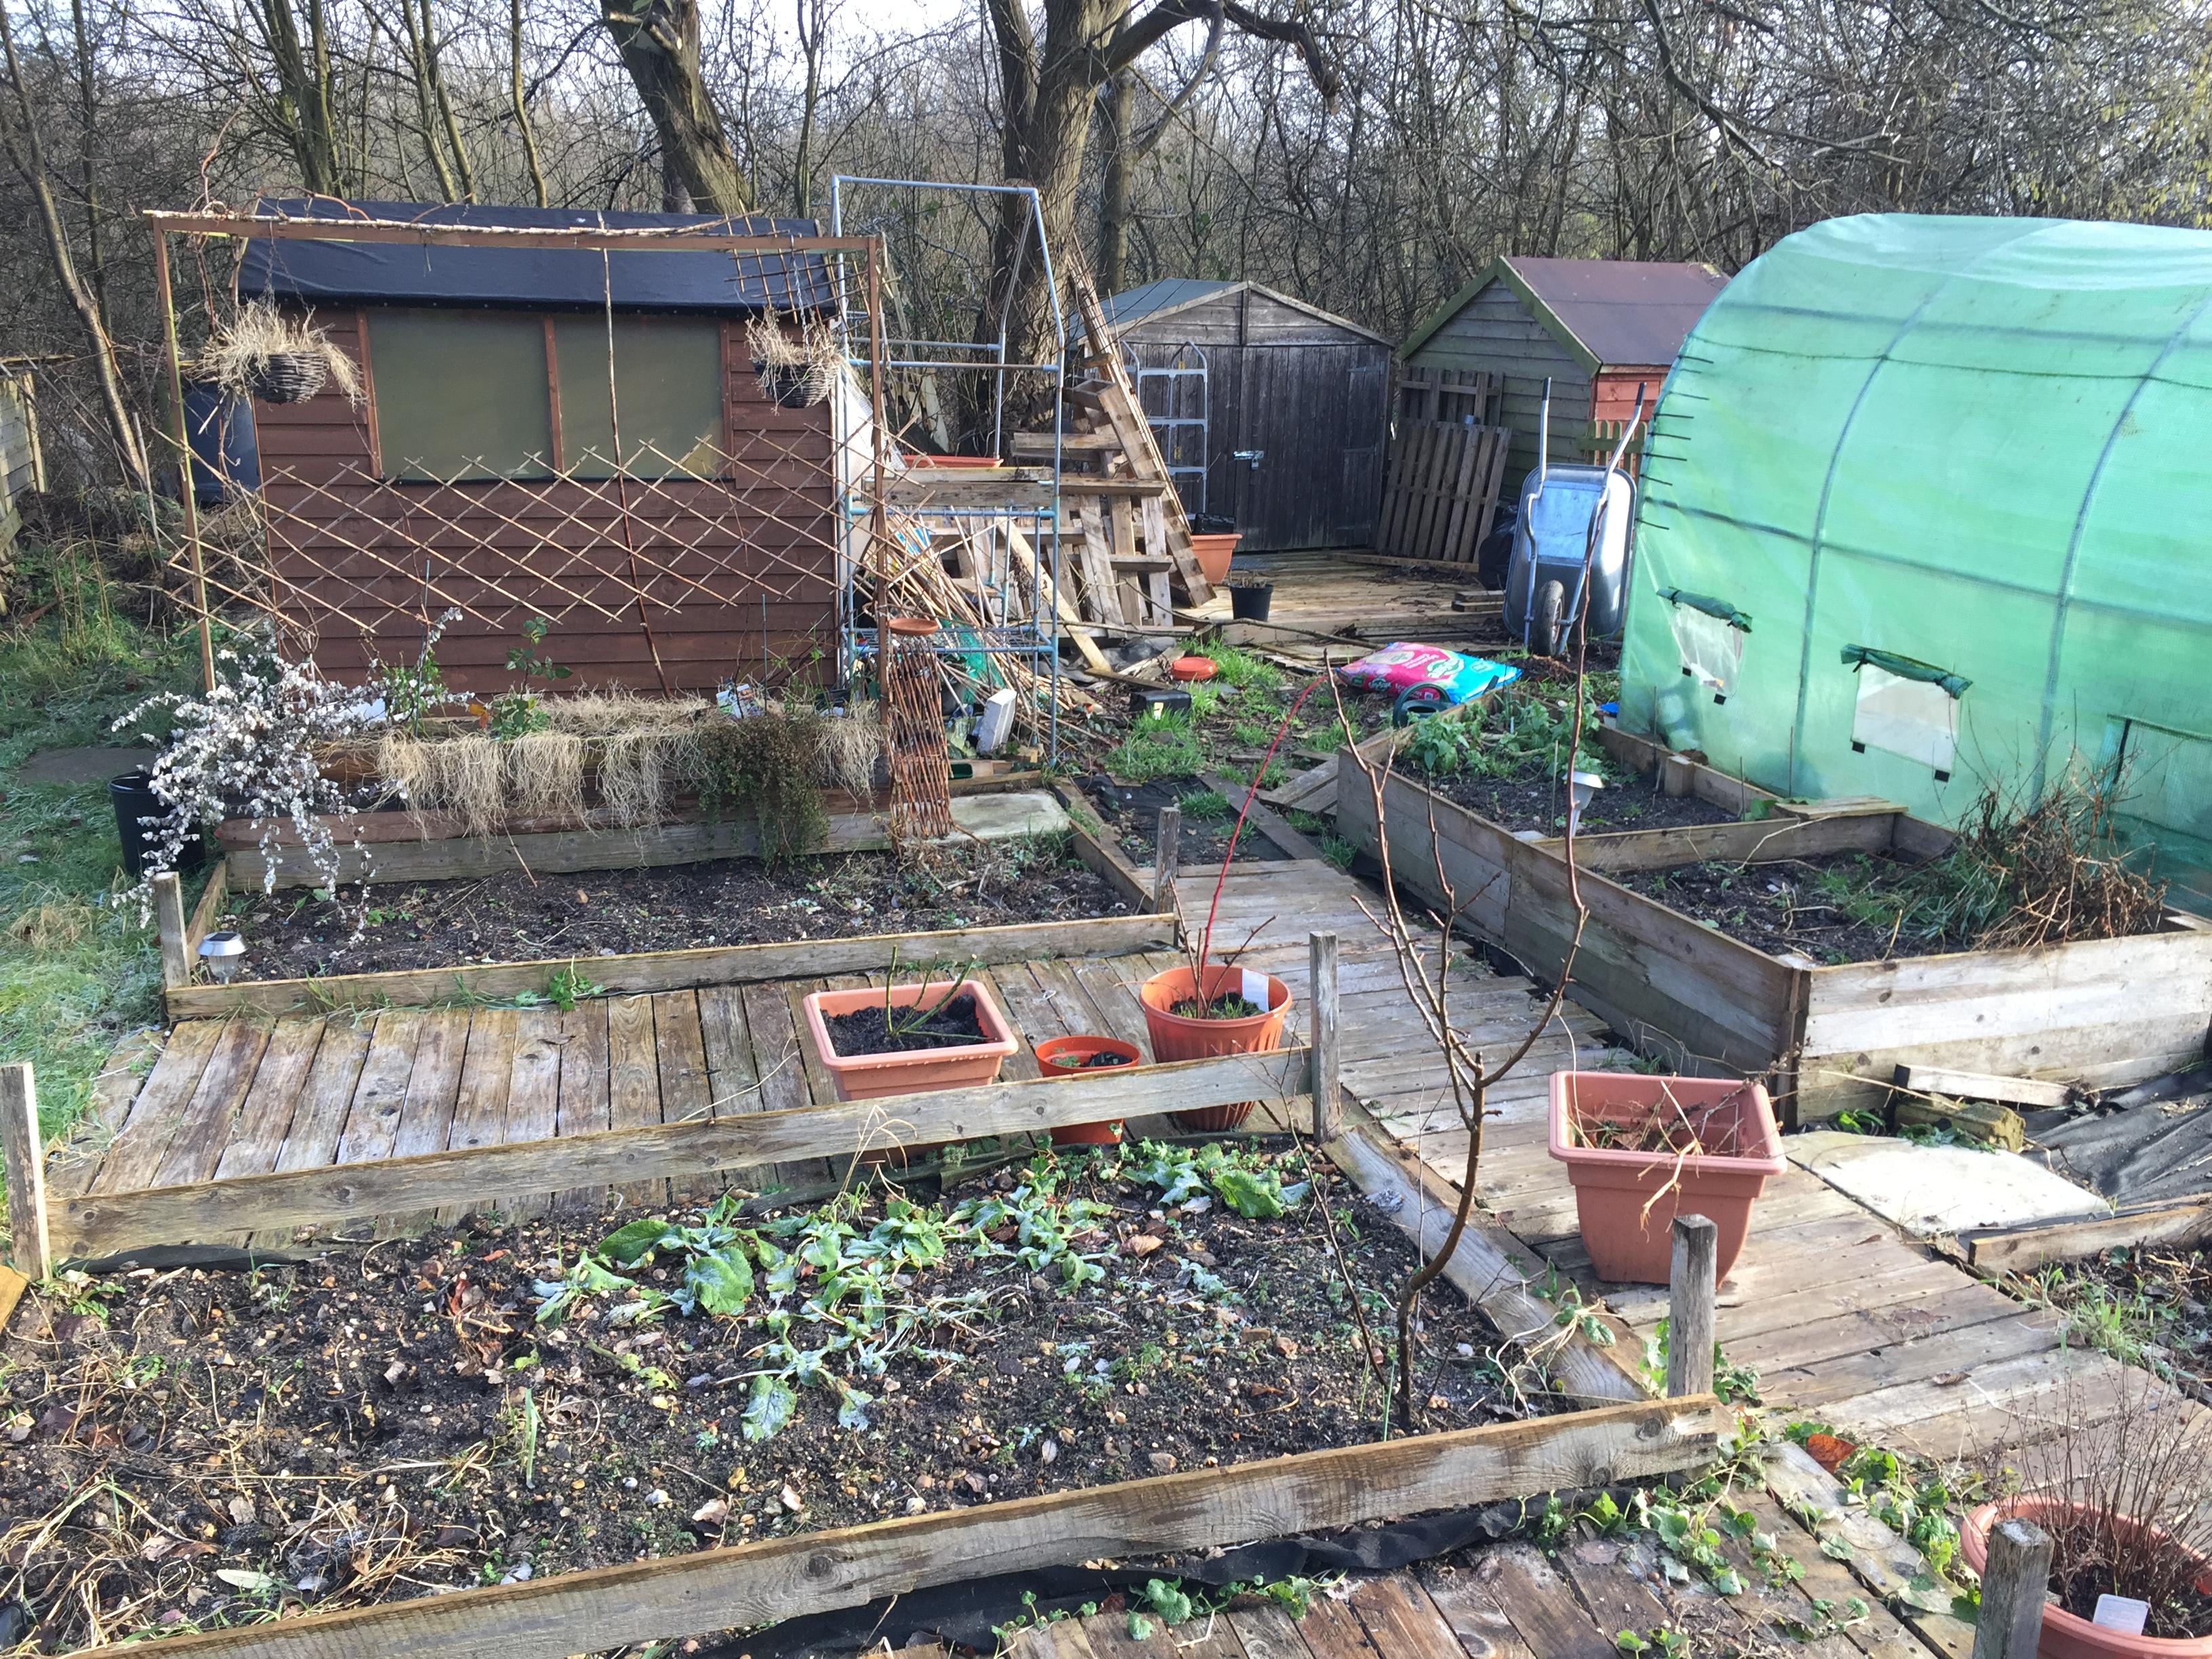 Garden Jobs in February